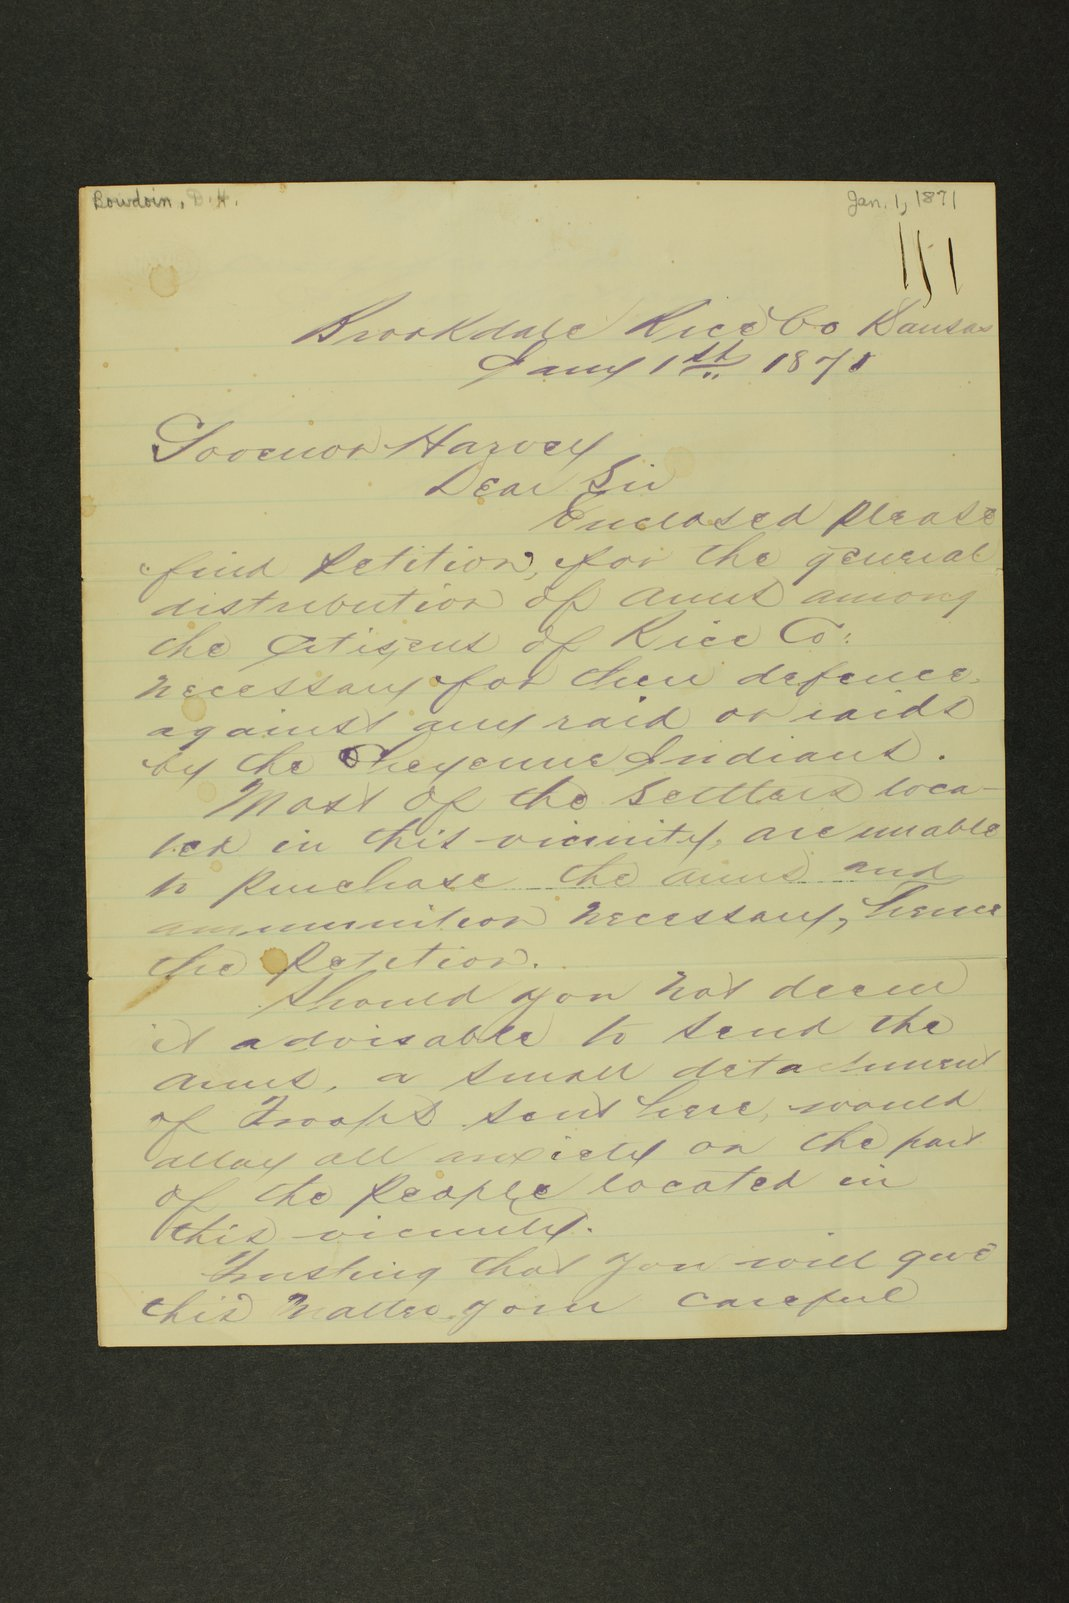 Kansas Adjutant General general correspondence, 1871 - 1 [January - April 1871]